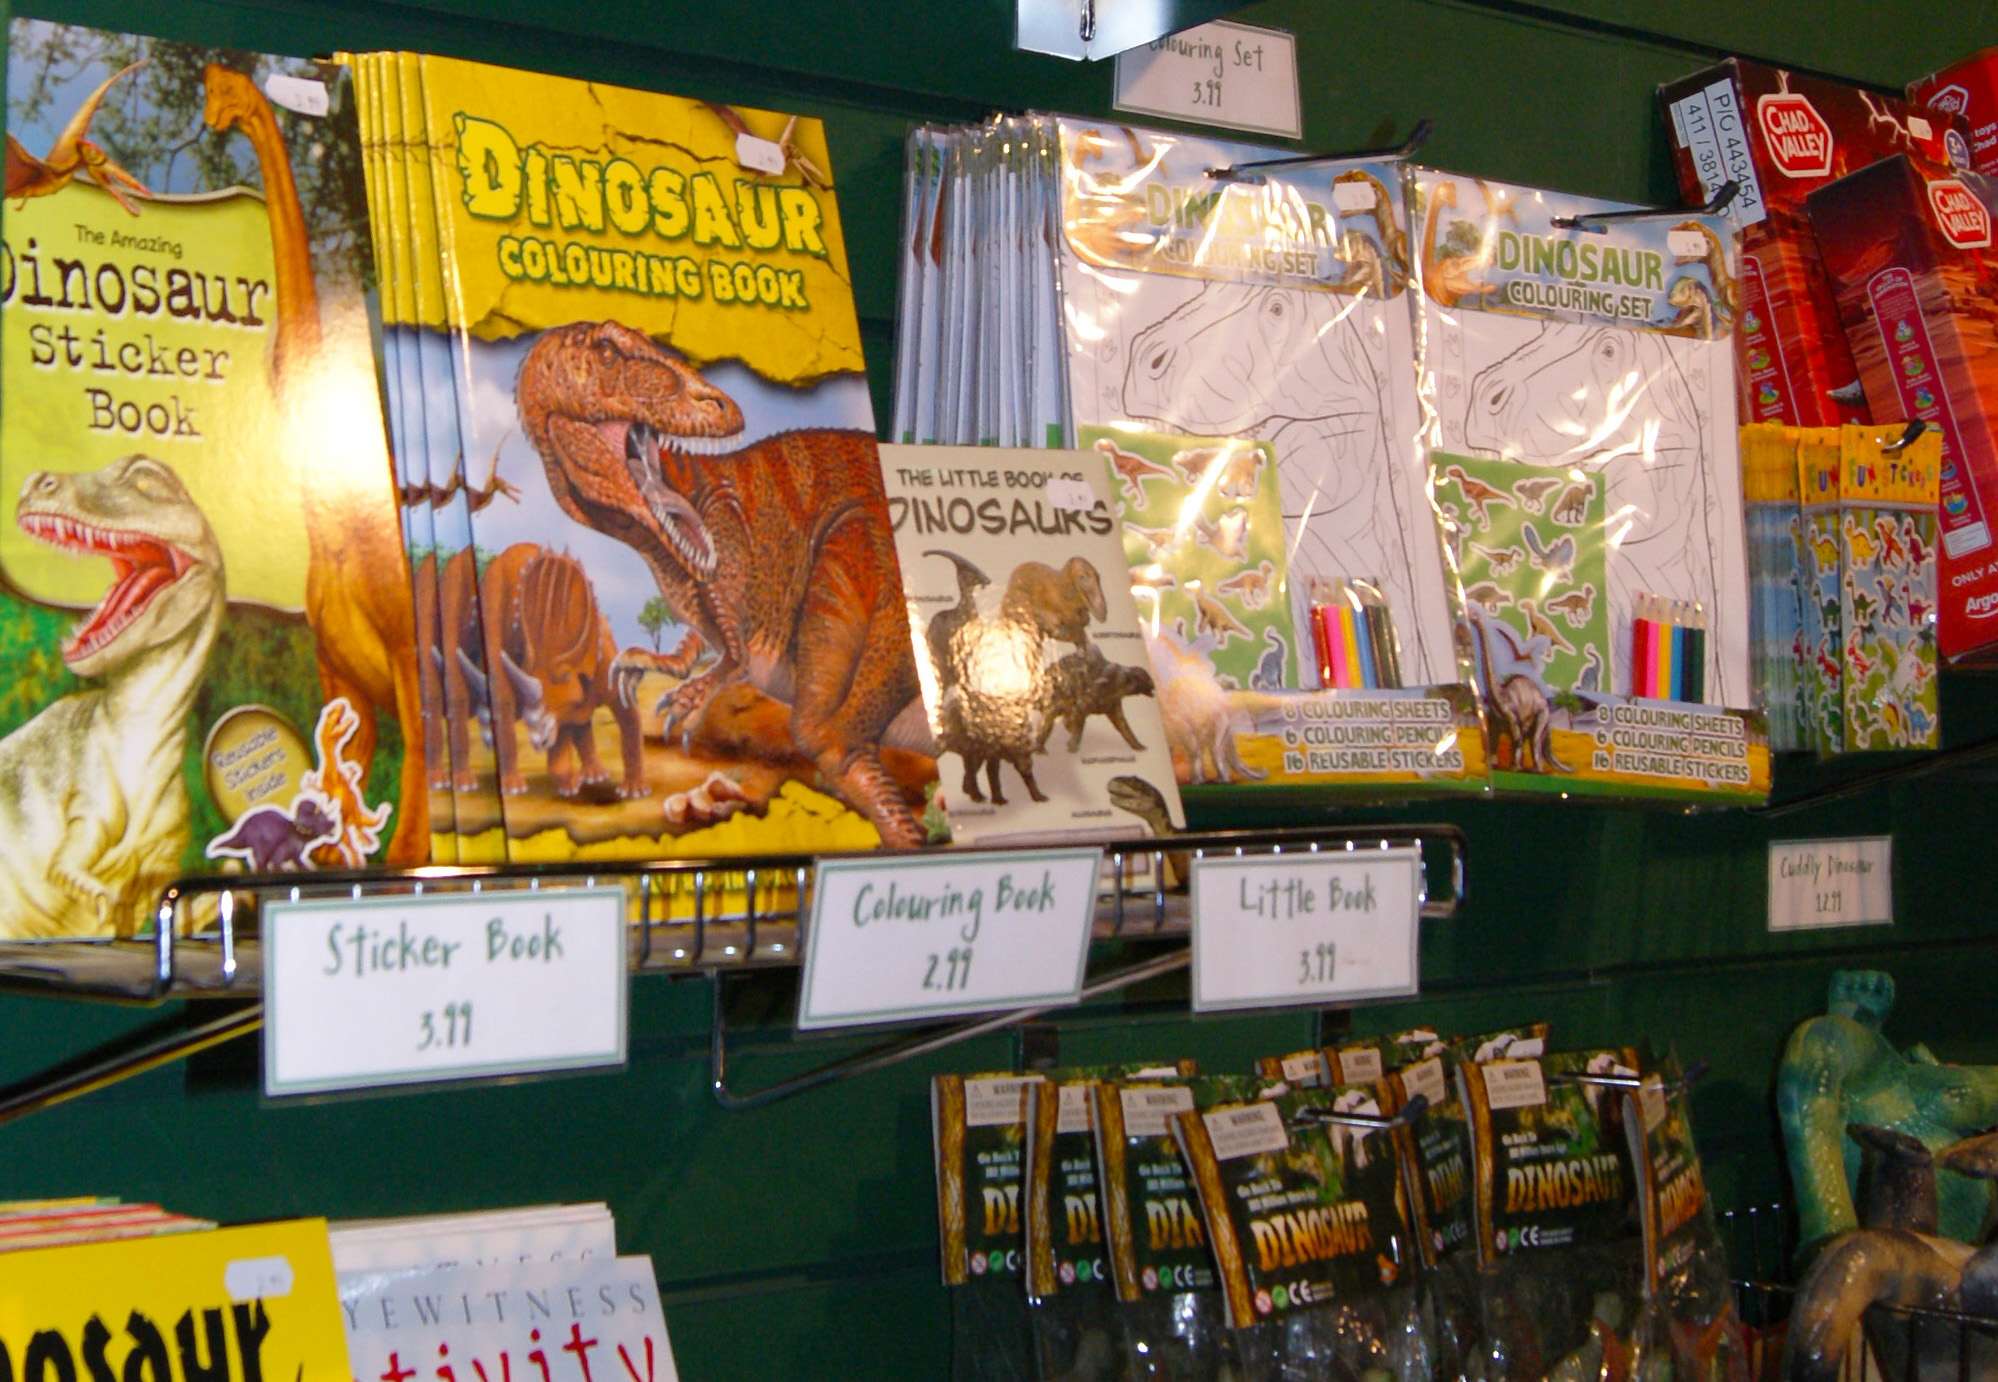 Pick up a souvenir dinosaur book!